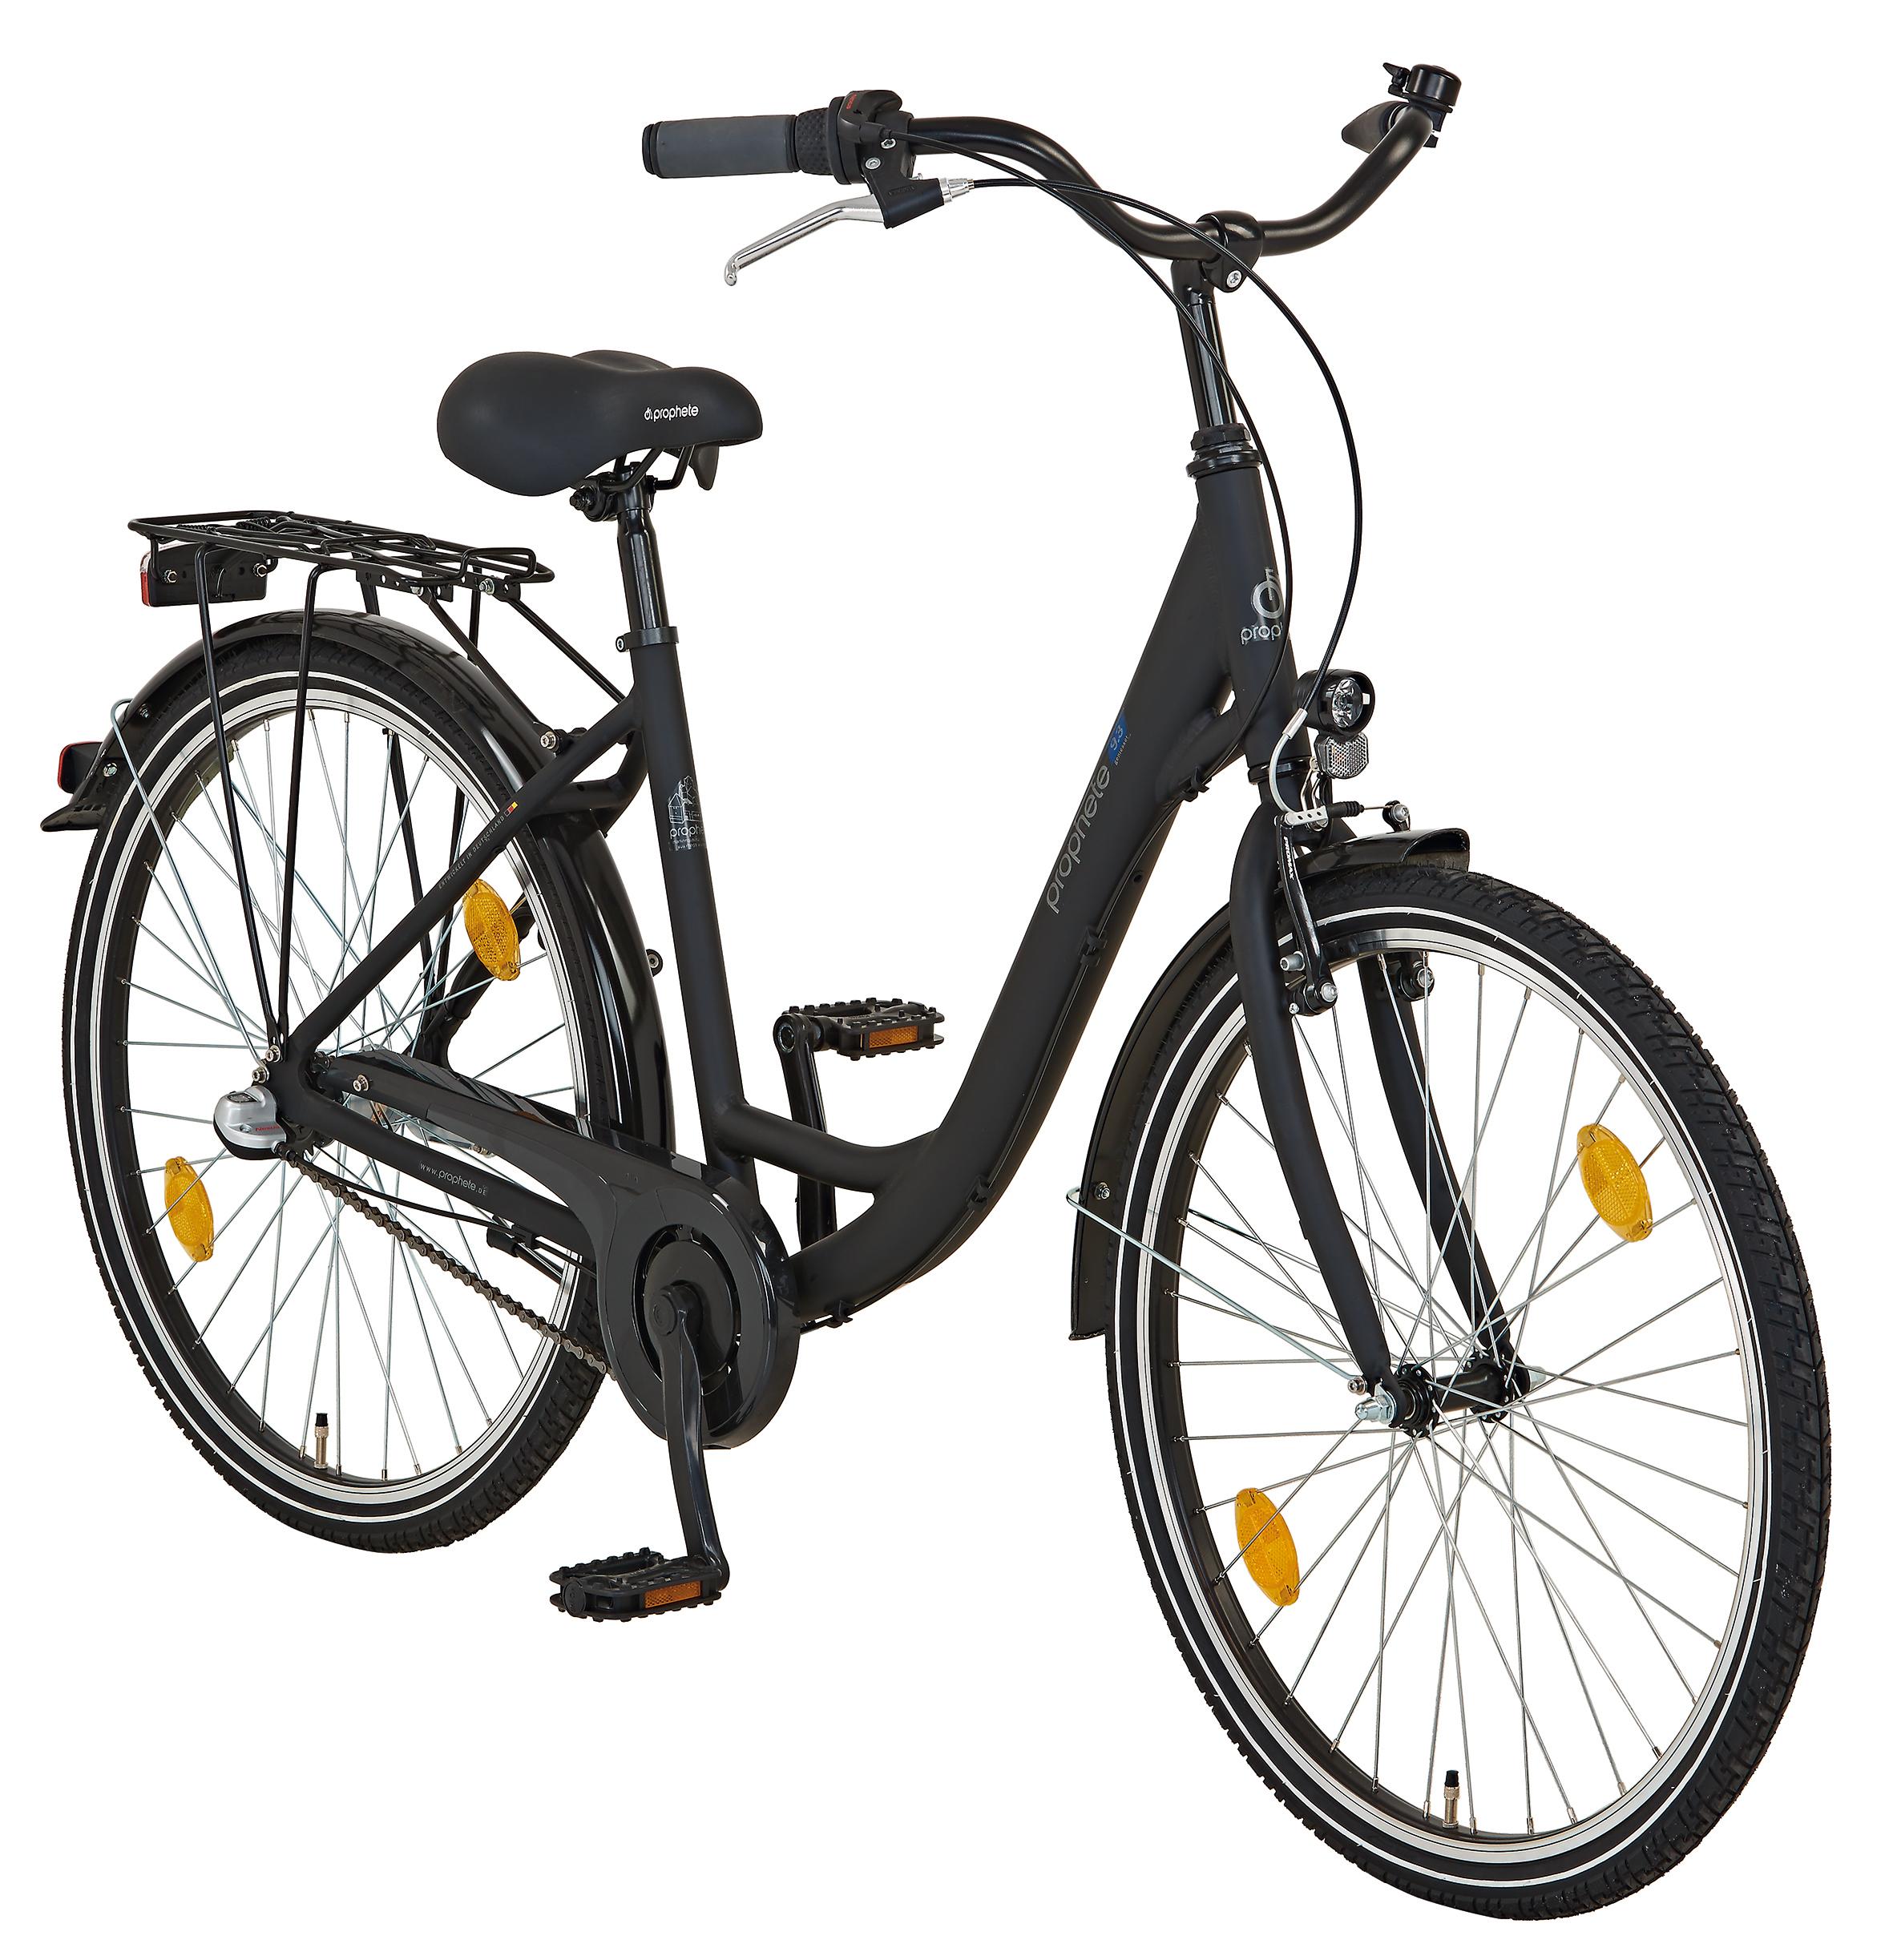 "Prophete Fahrrad / Cityrad Geniesser 9.3 City Bike 26"" Damen Bild 2"